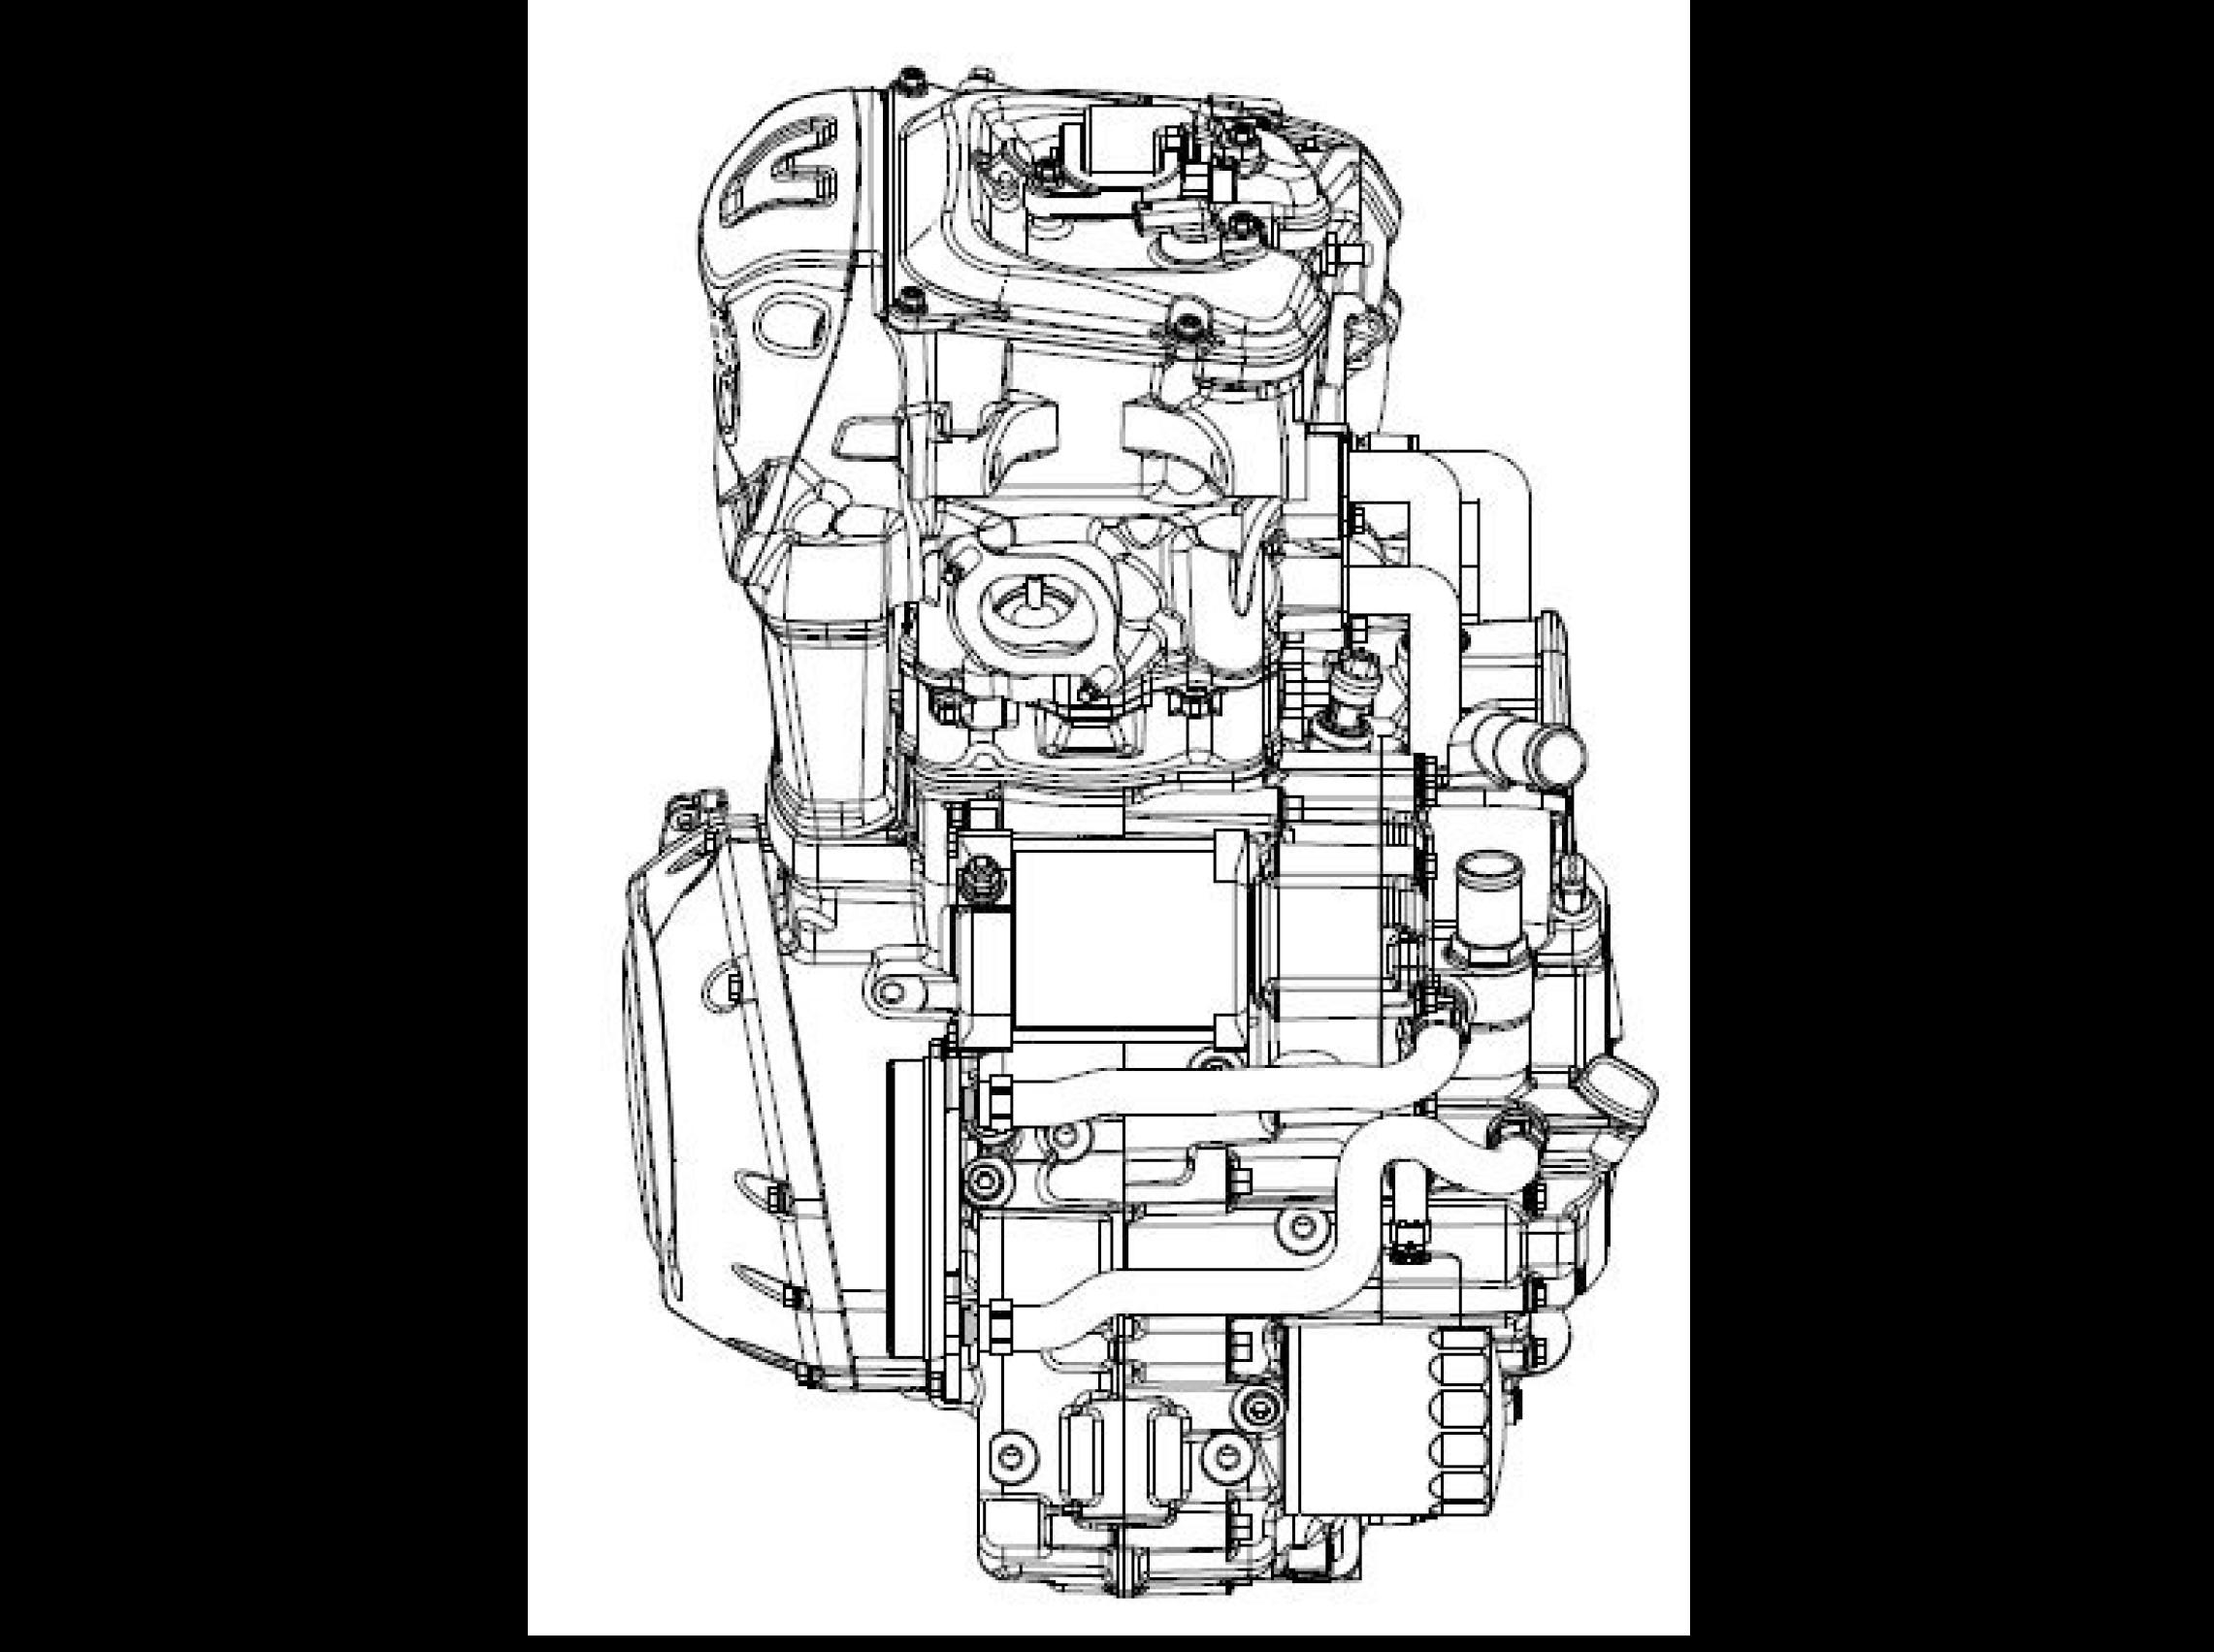 040419-harley-davidson-new-60-degree-v-twin-engine-0001-fig-4